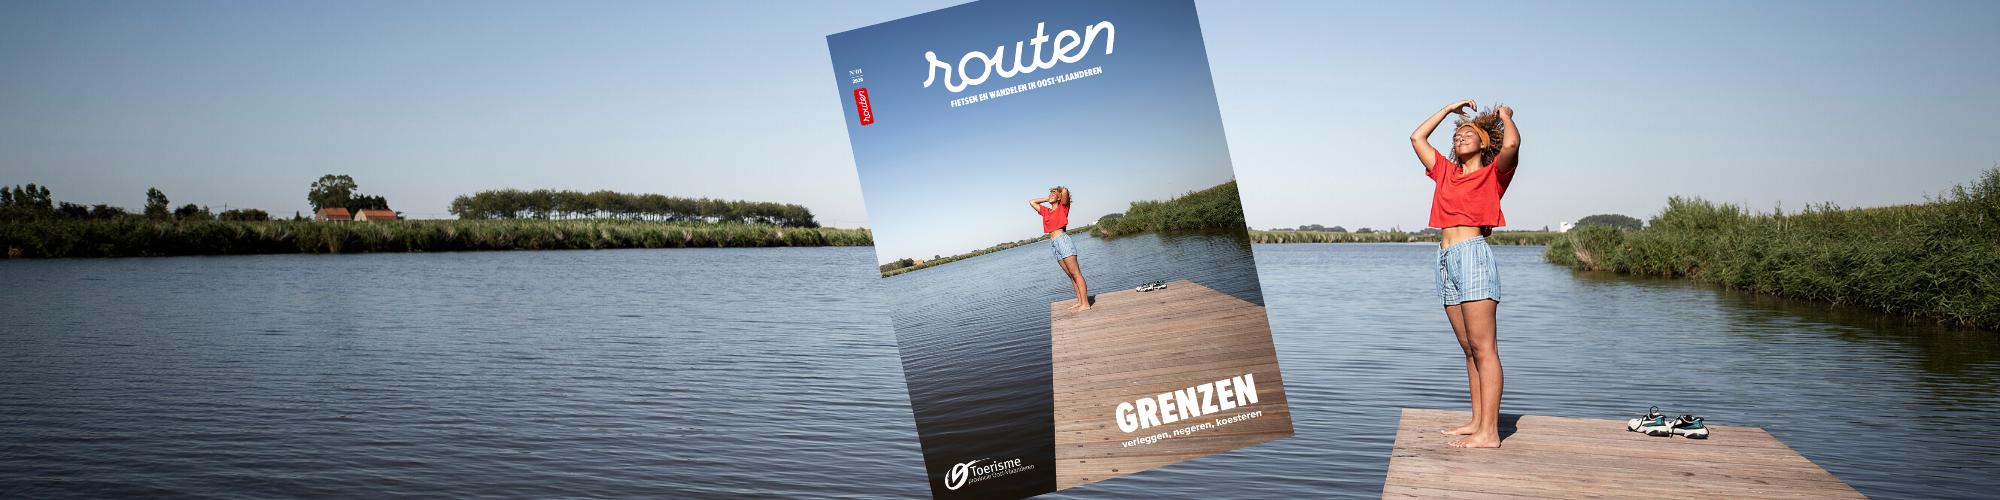 Nieuw: Routen magazine